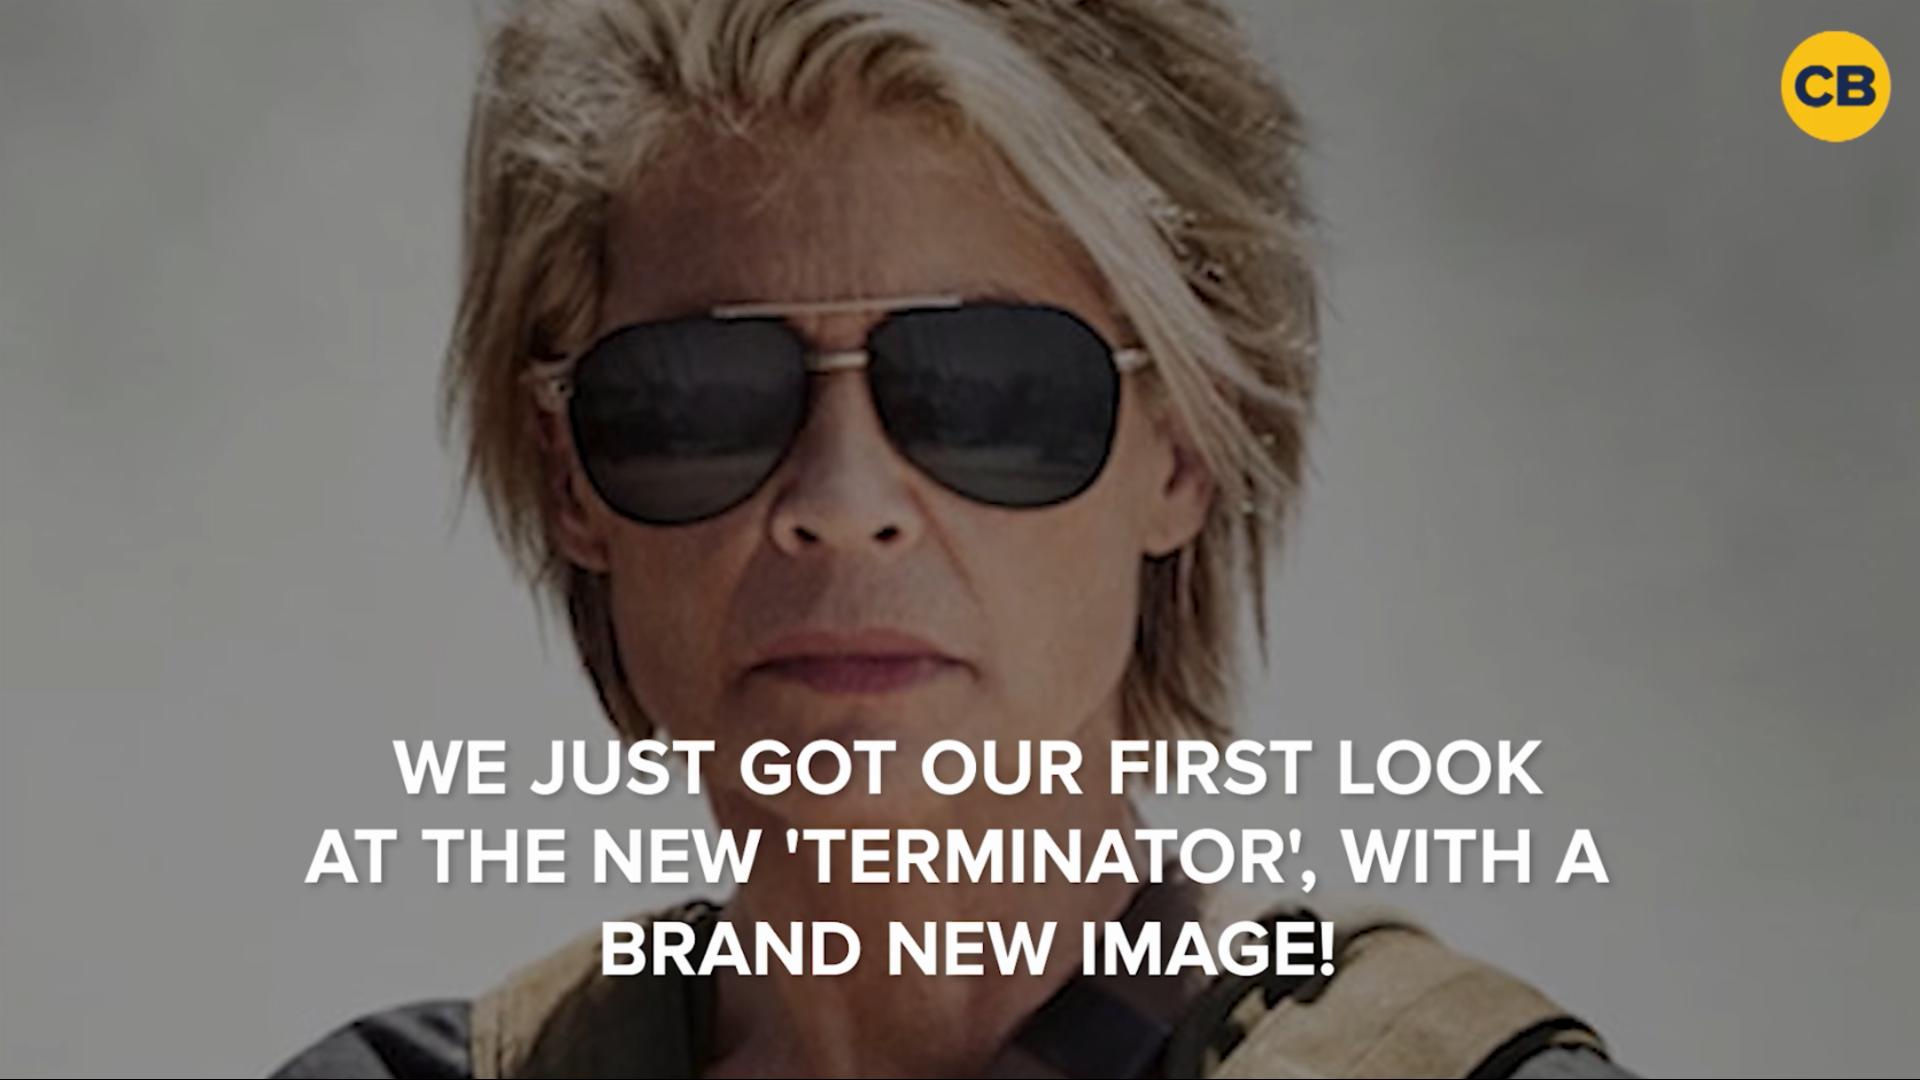 'Terminator' Sequel First Look Revealed screen capture